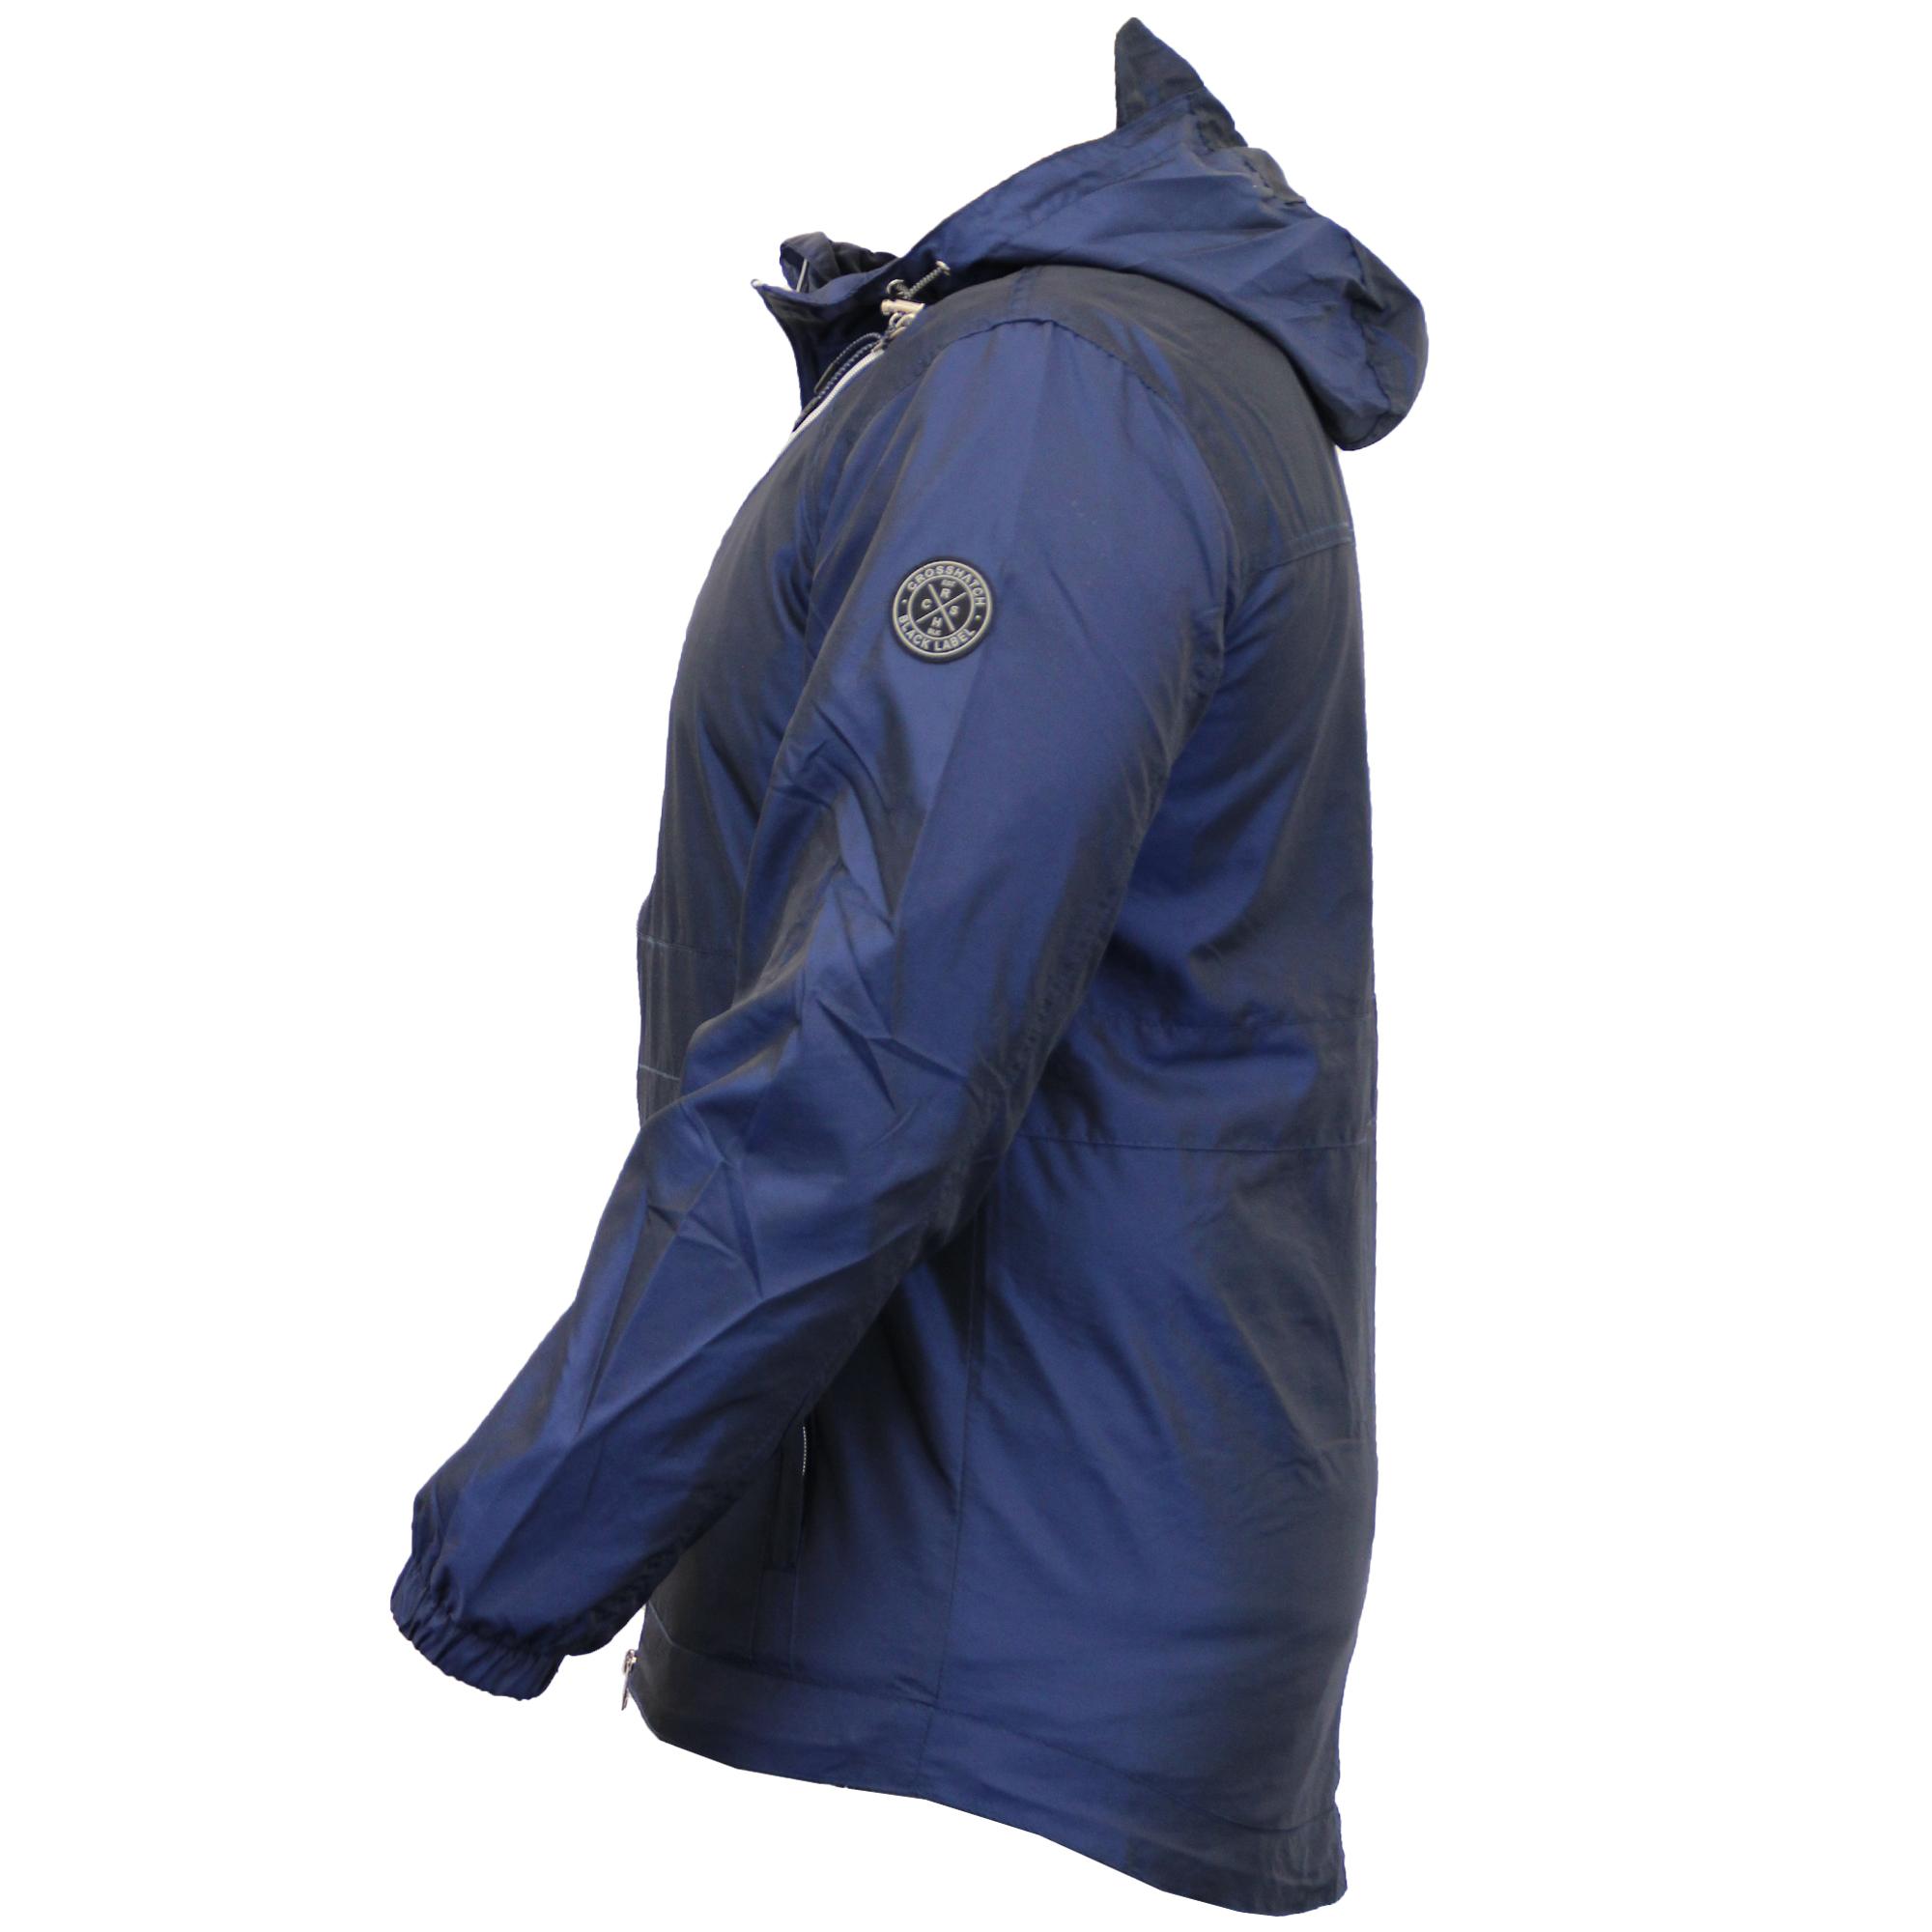 Mens-Windbreaker-Jacket-Crosshatch-Coat-Hooded-Mesh-Lined-Zip-Casual-Summer-New thumbnail 8